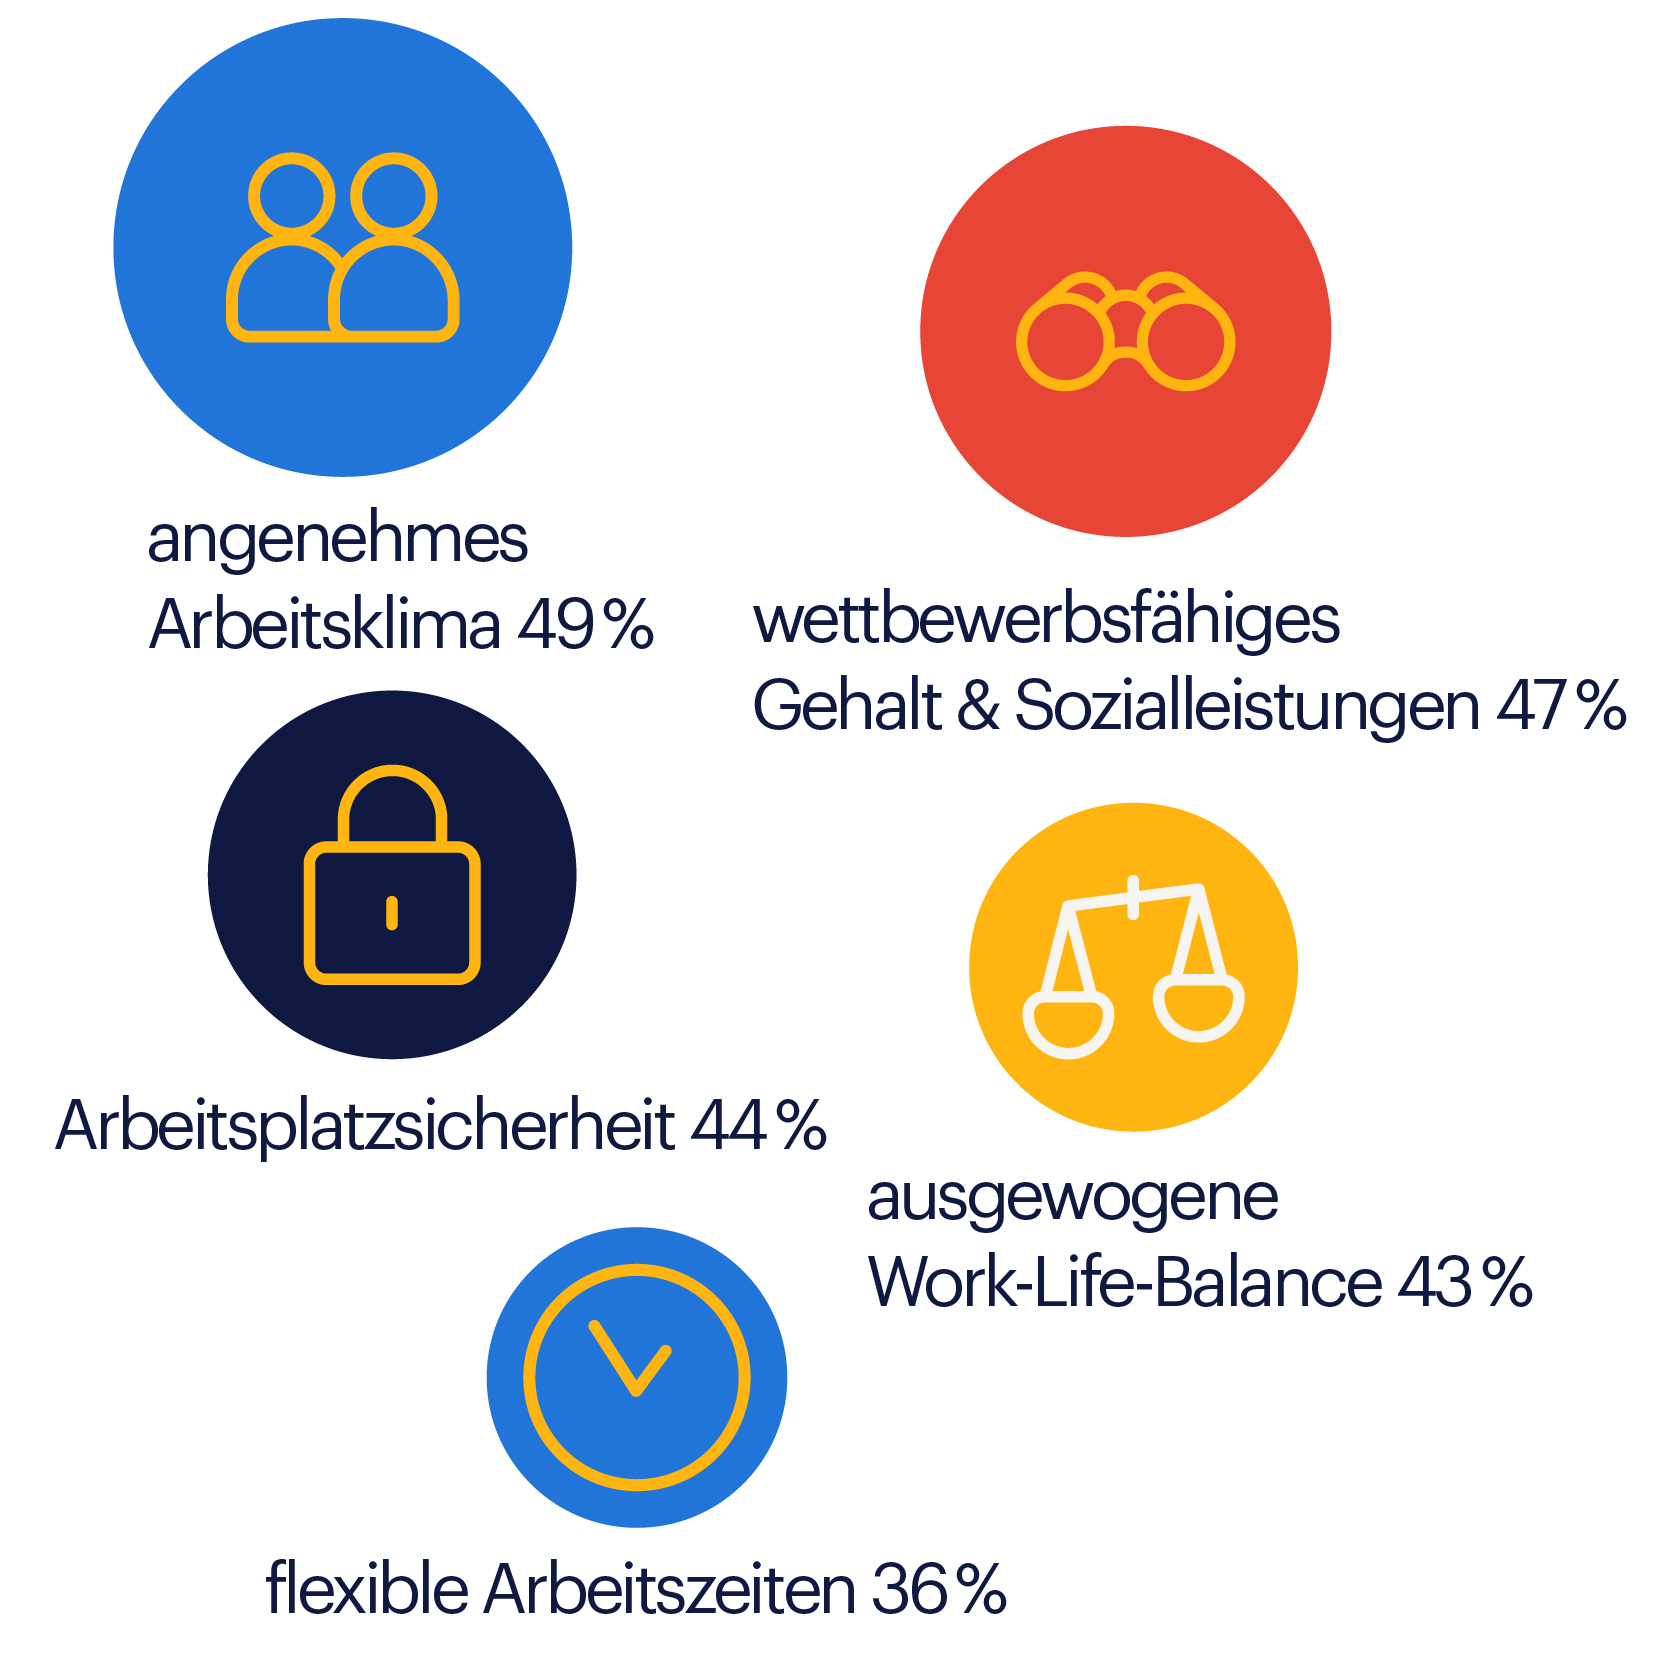 REBR_Infografik_Mitarbeiter bleiben